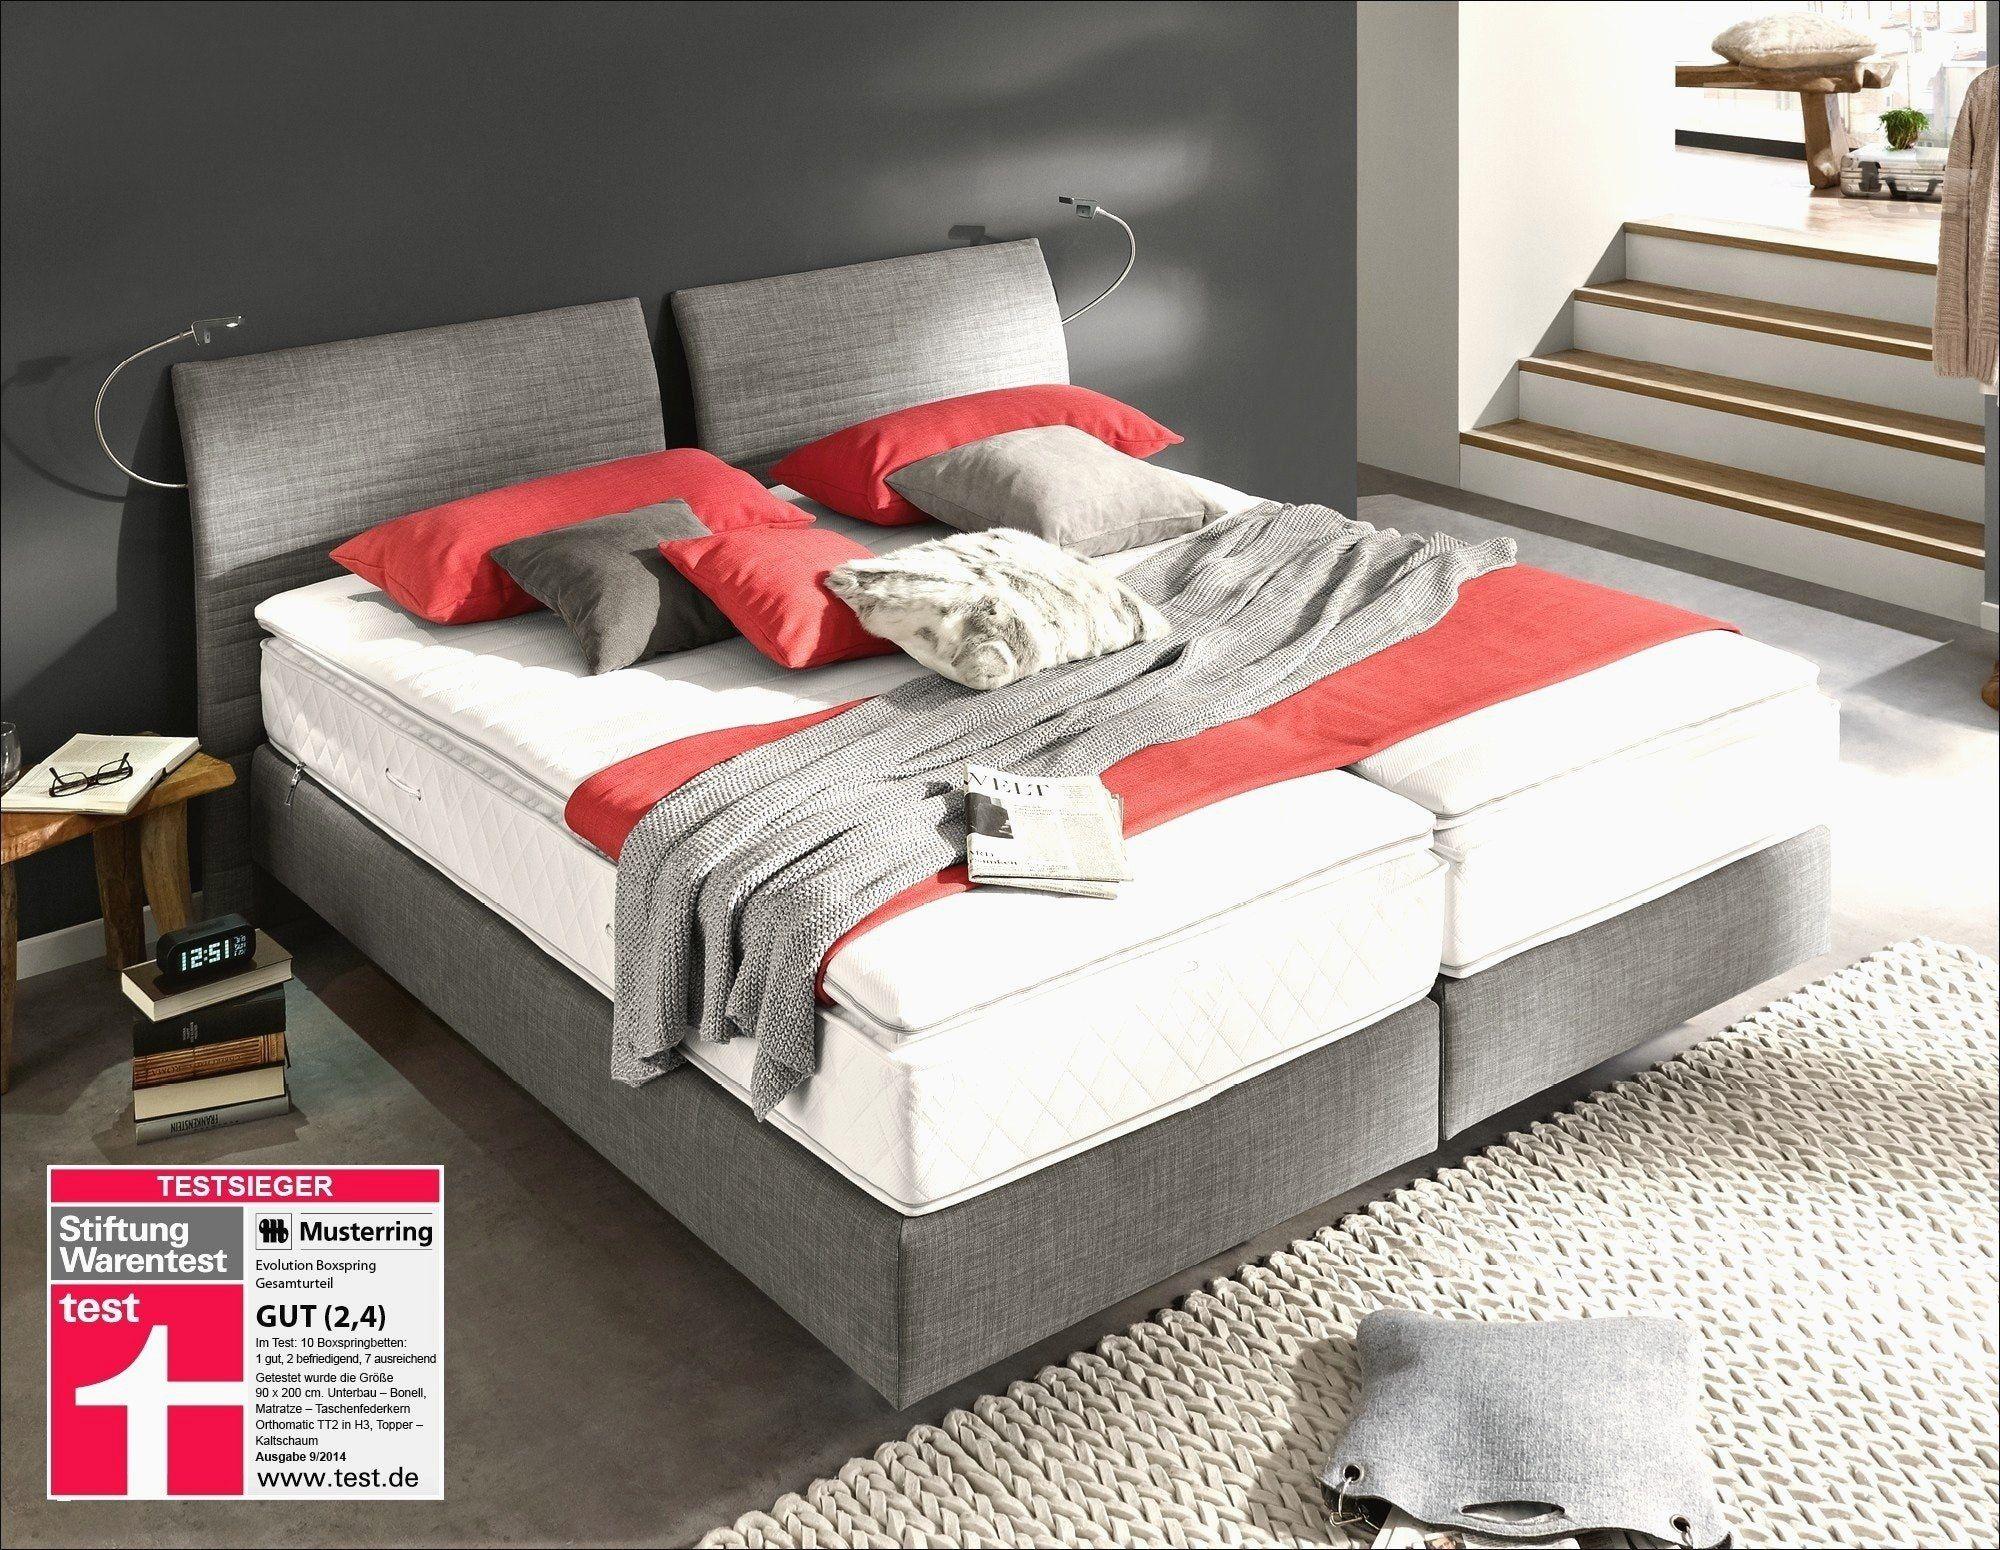 30 Schon Musterring Boxspringbett Evolution Kinderbett Matratze Bett Big Sofa Mit Schlaffunktion